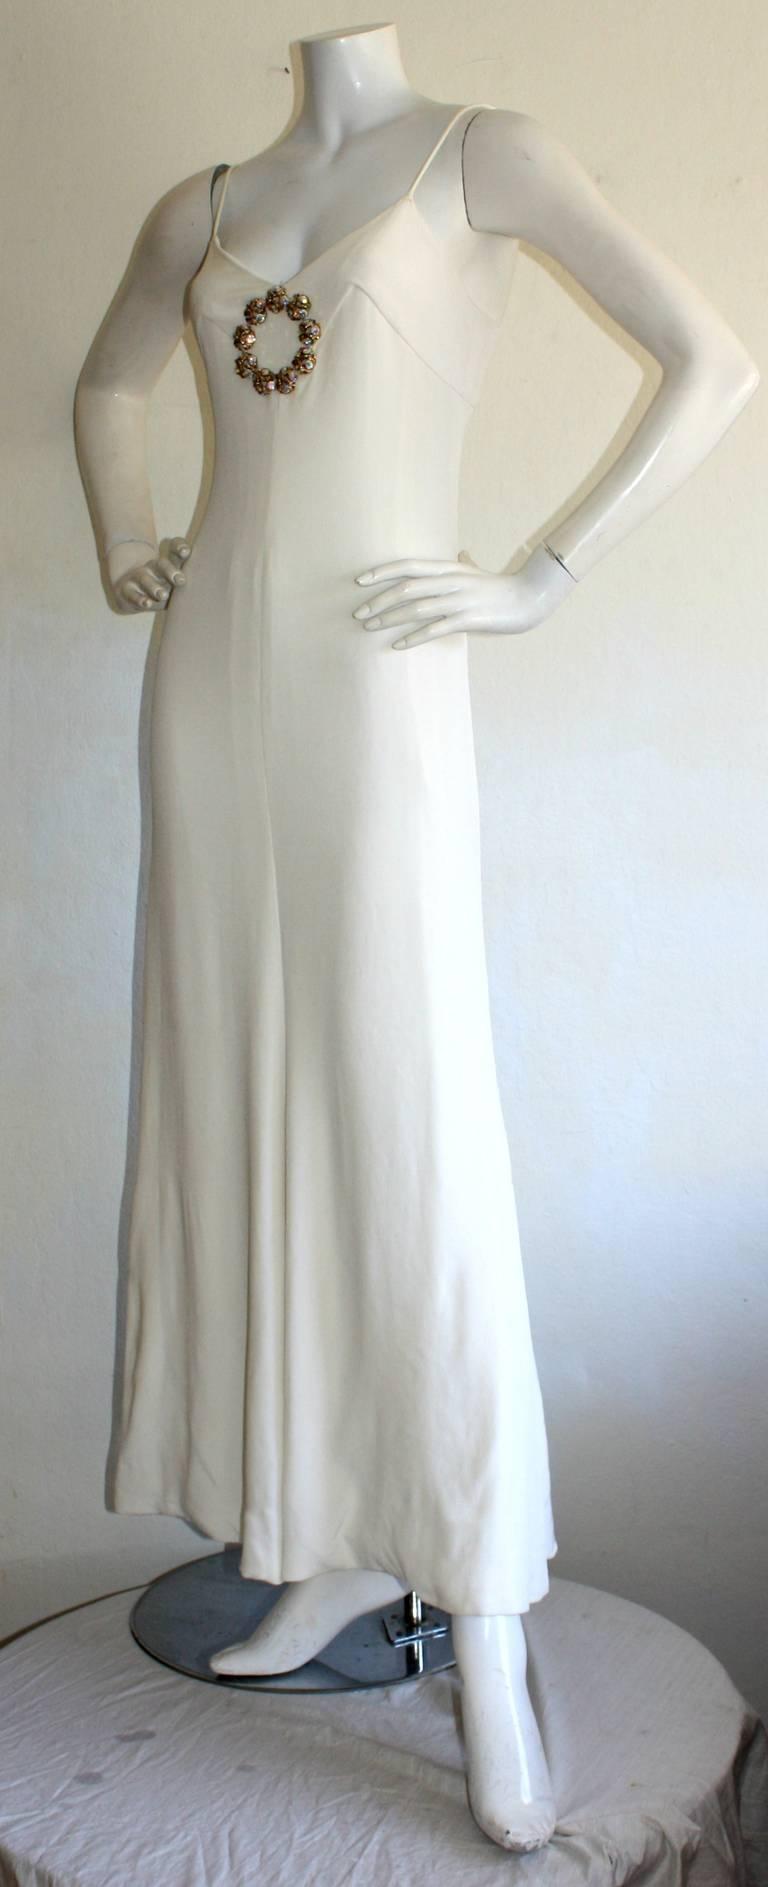 Beautiful 1970s Vintage Oscar de la Renta White Jewel Gown Perfect Wedding Dress 4